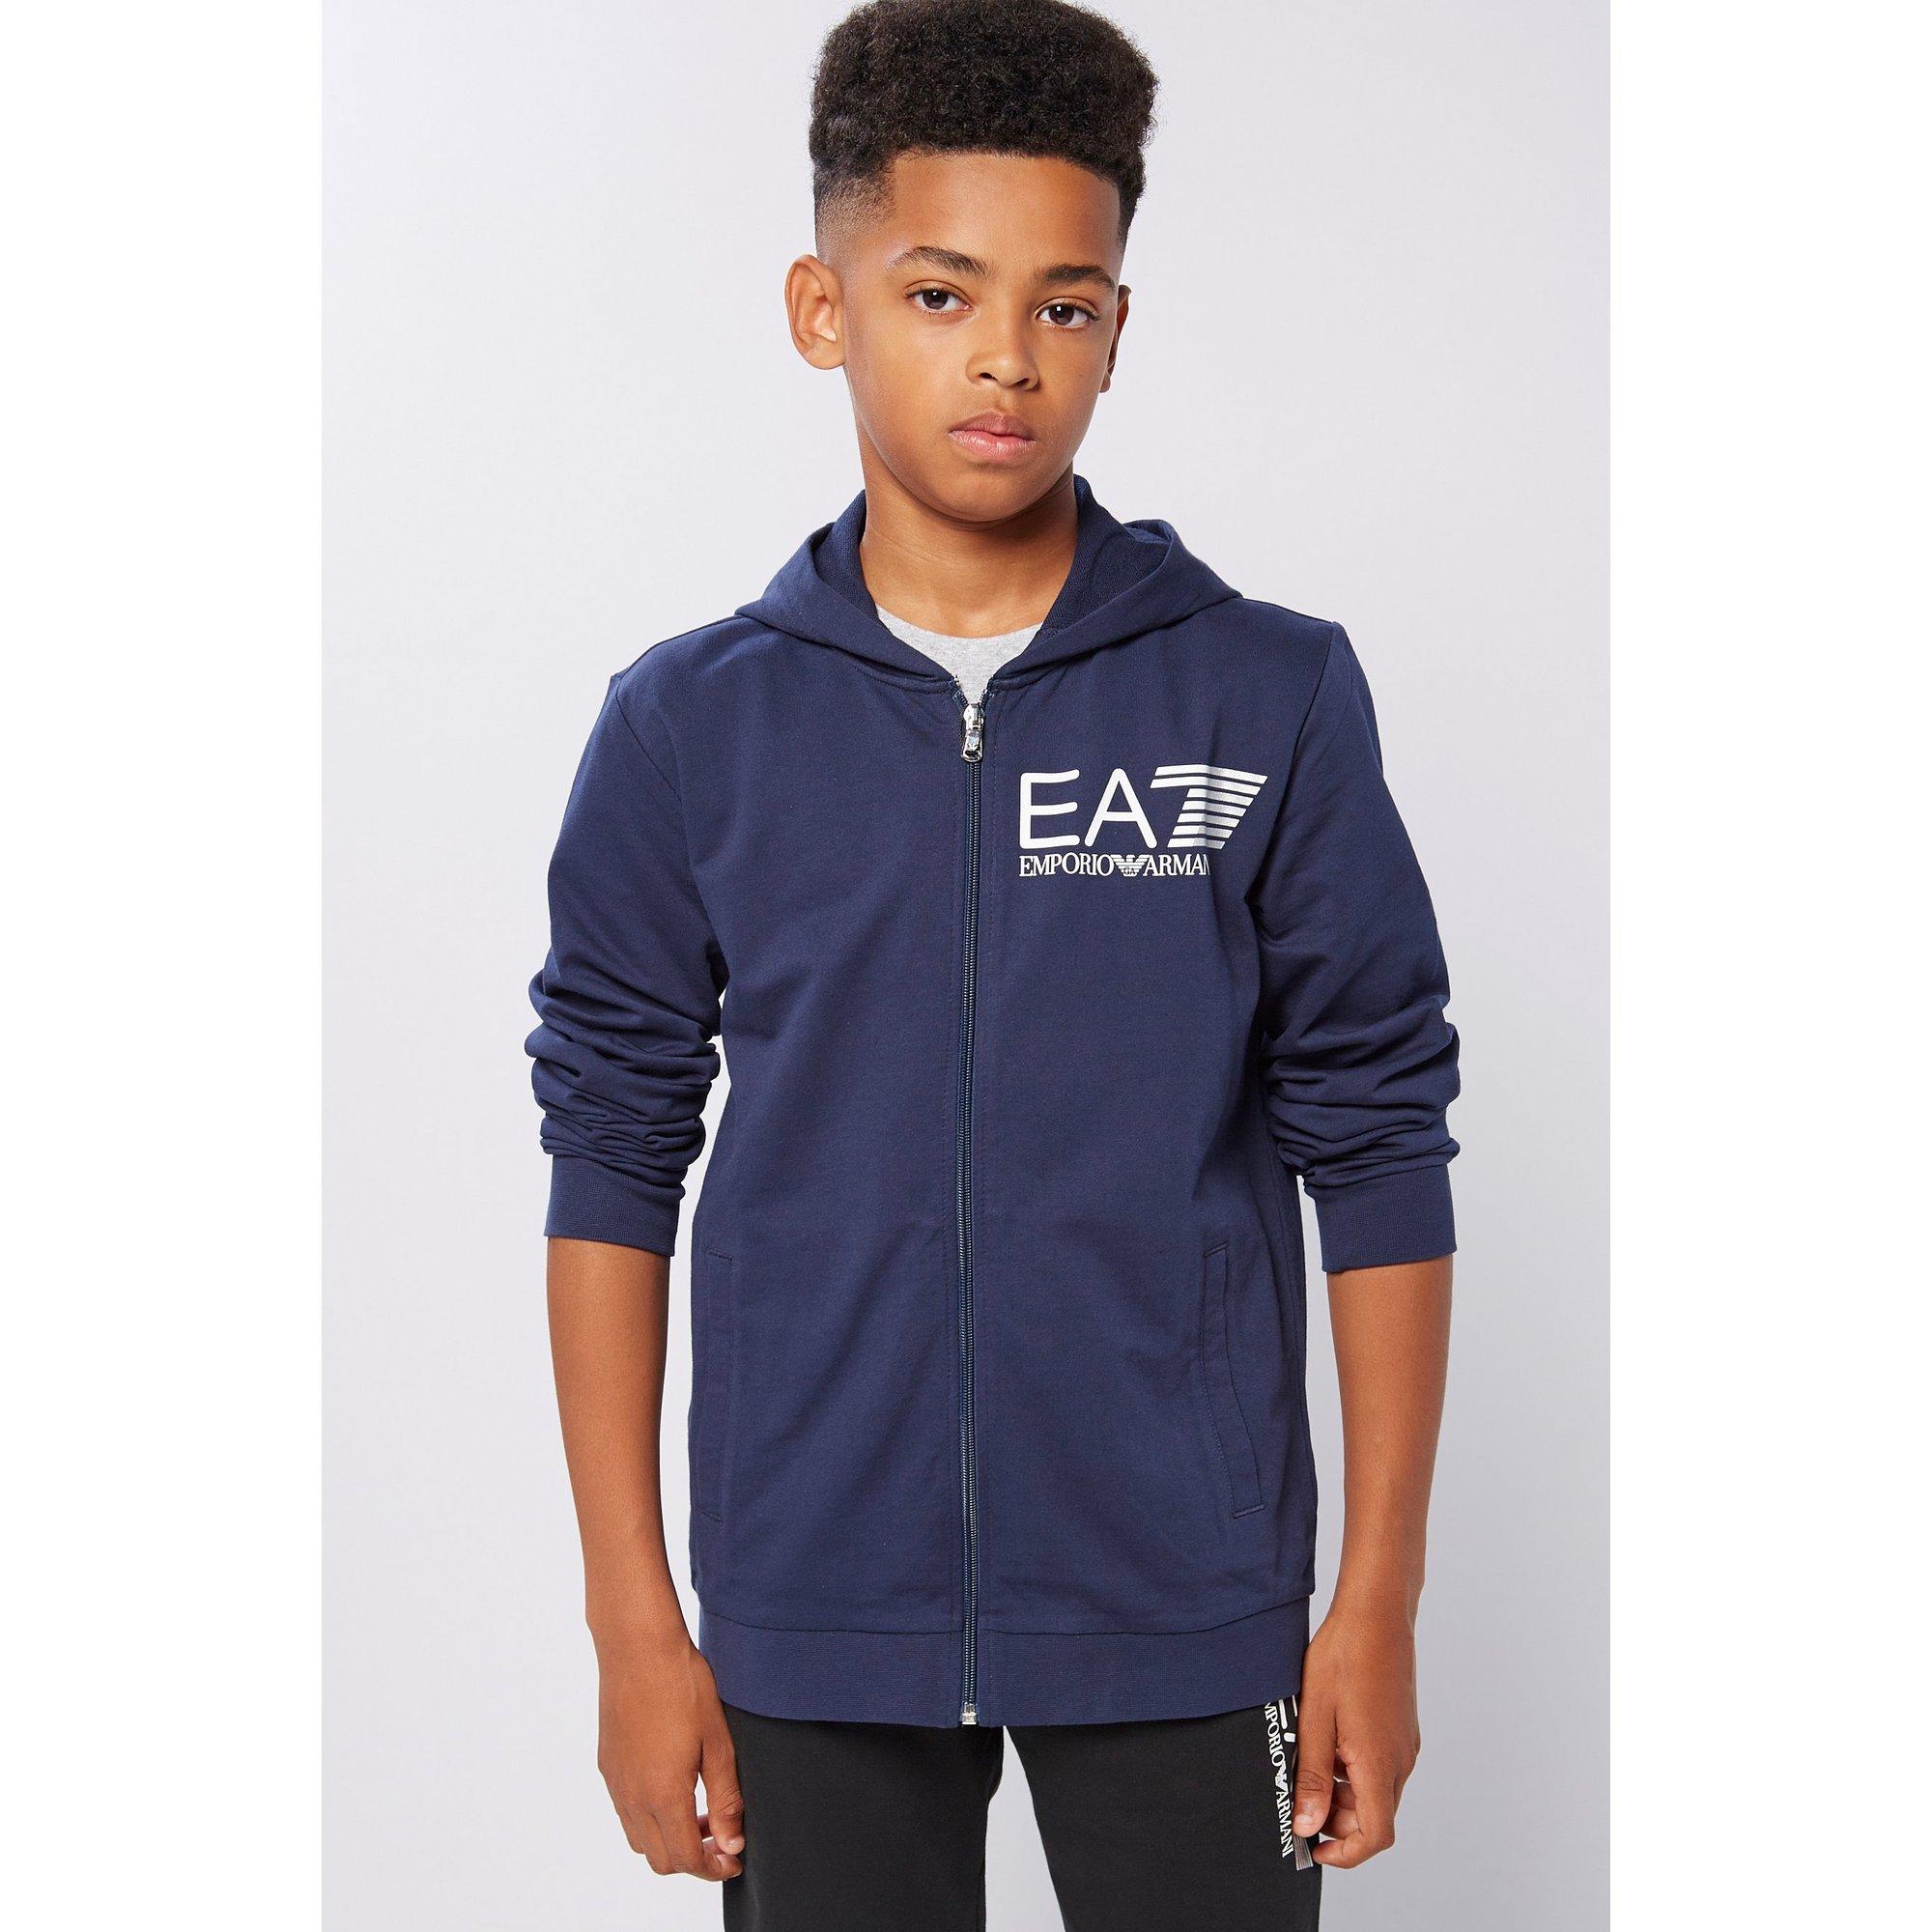 Image of Boys EA7 Visibility Zip Through Hoody